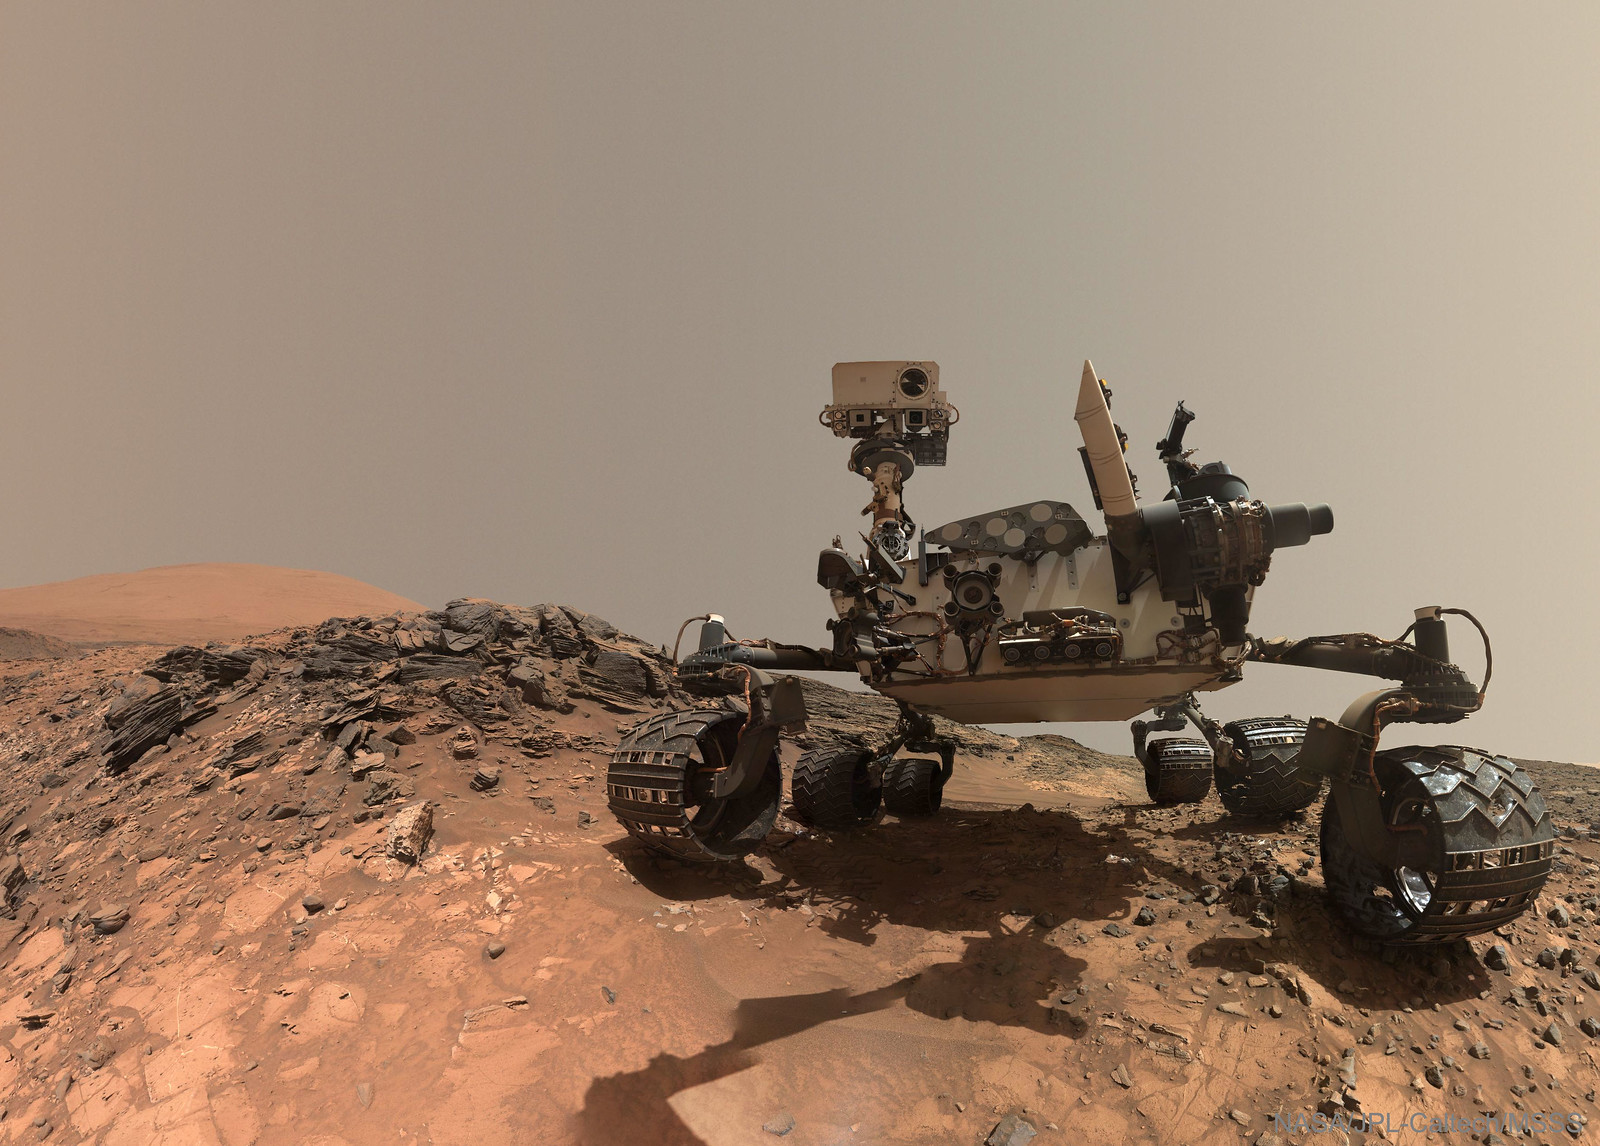 Curiosity Rover Takes Selfie on Mars